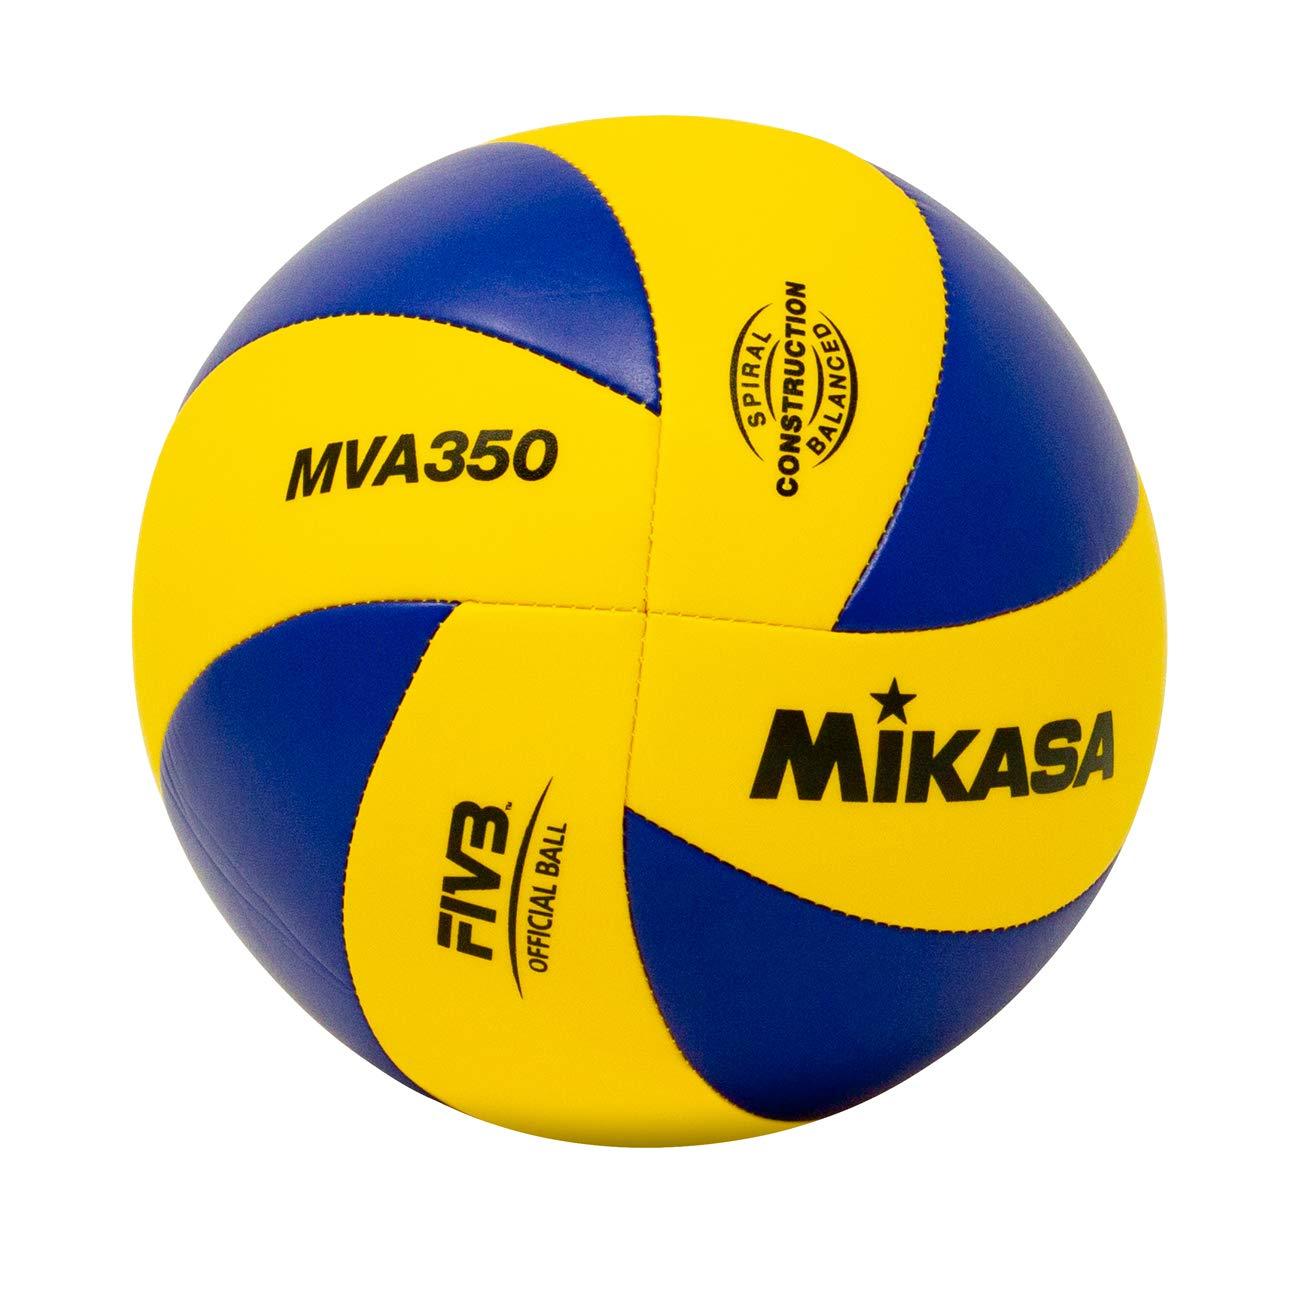 Mikasa D43Innen Olympischen Replica Volleyball Mikasa Sports USA MVA350